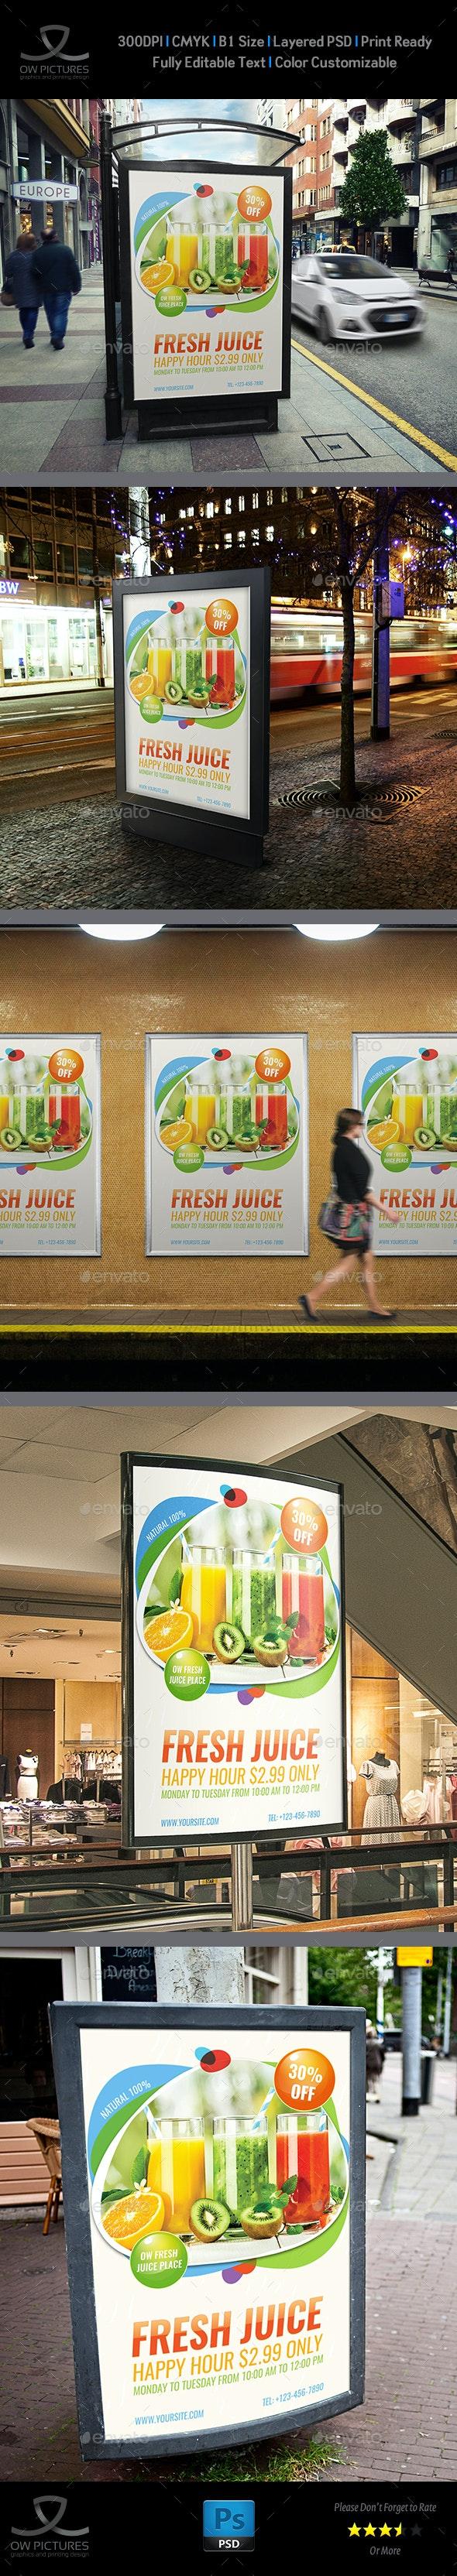 Fresh Juice Poster Template - Signage Print Templates